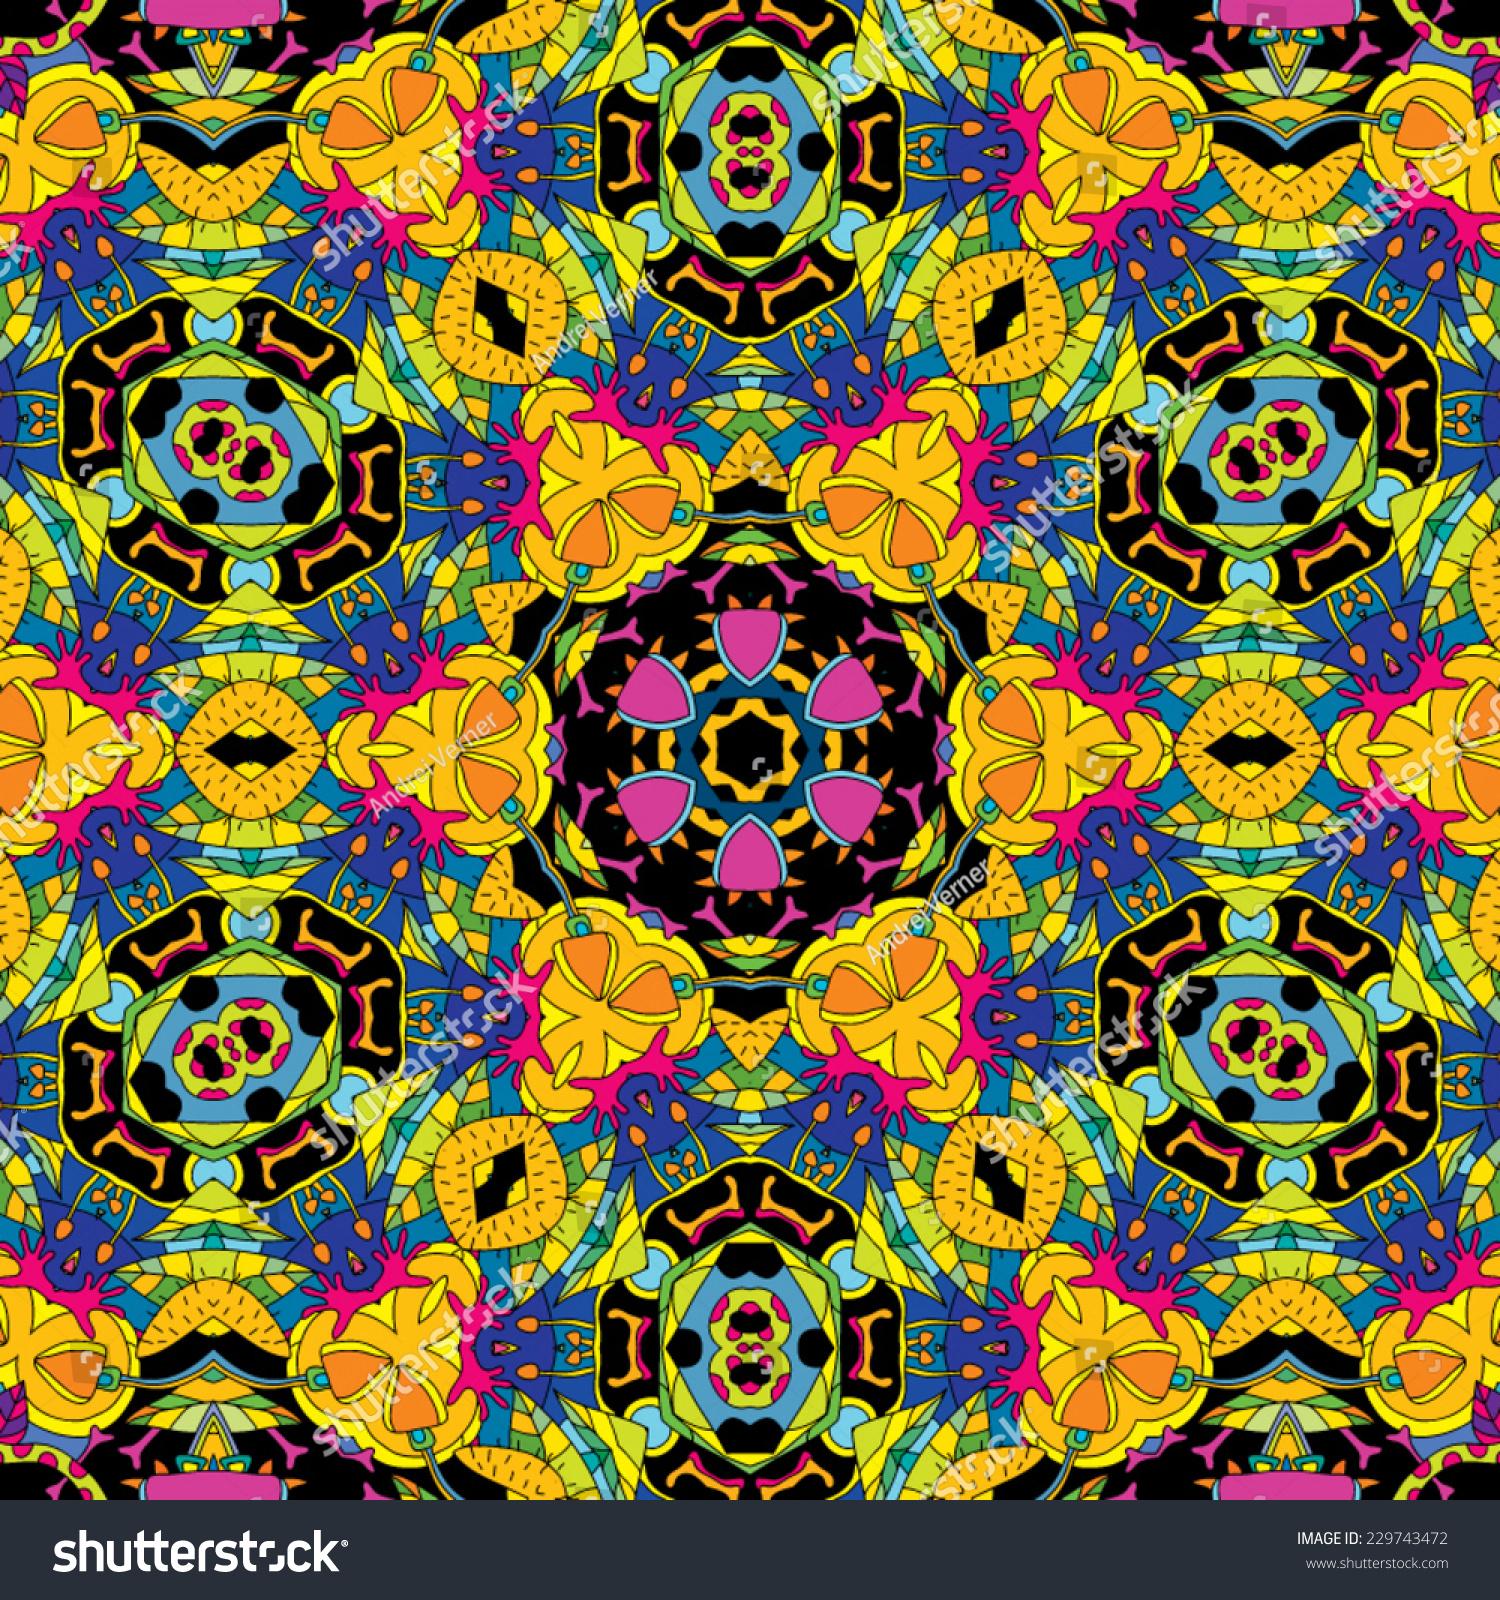 Psychedelic Magic Mushroom Hallucination Jungle Seamless Stock Photo ...